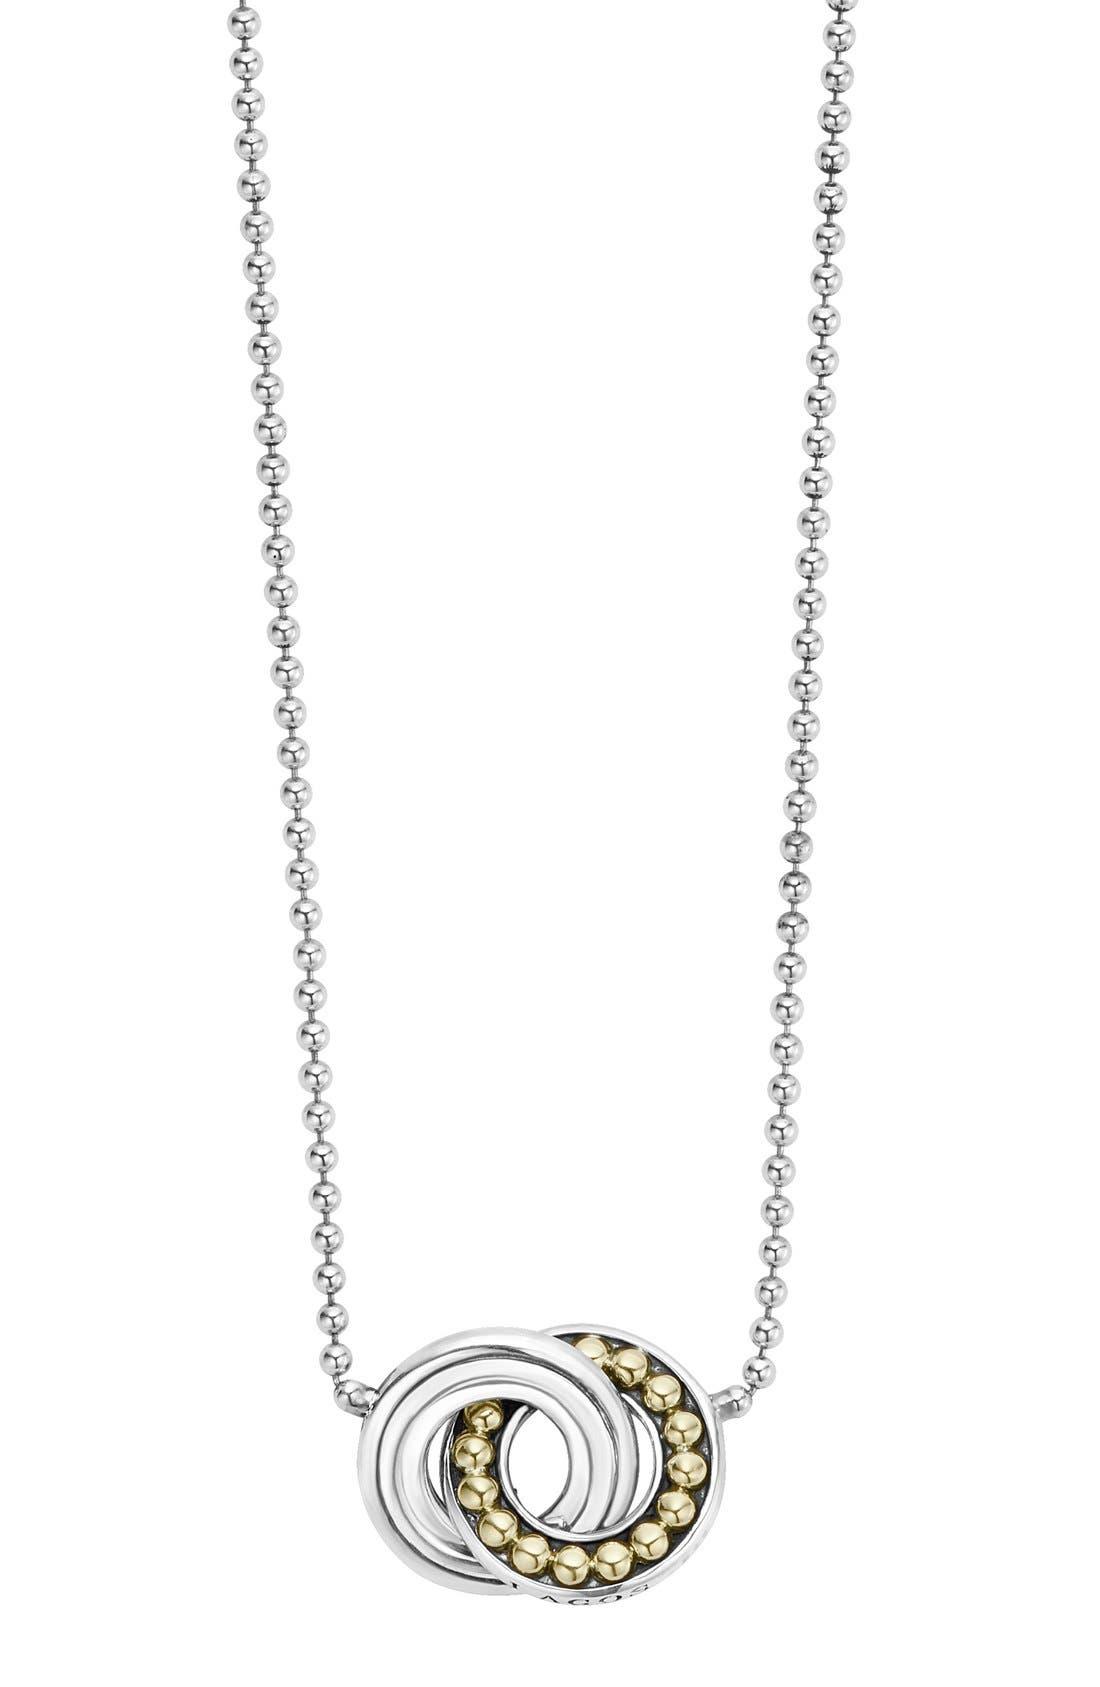 Enso Pendant Necklace,                             Main thumbnail 1, color,                             SILVER/ PEARL